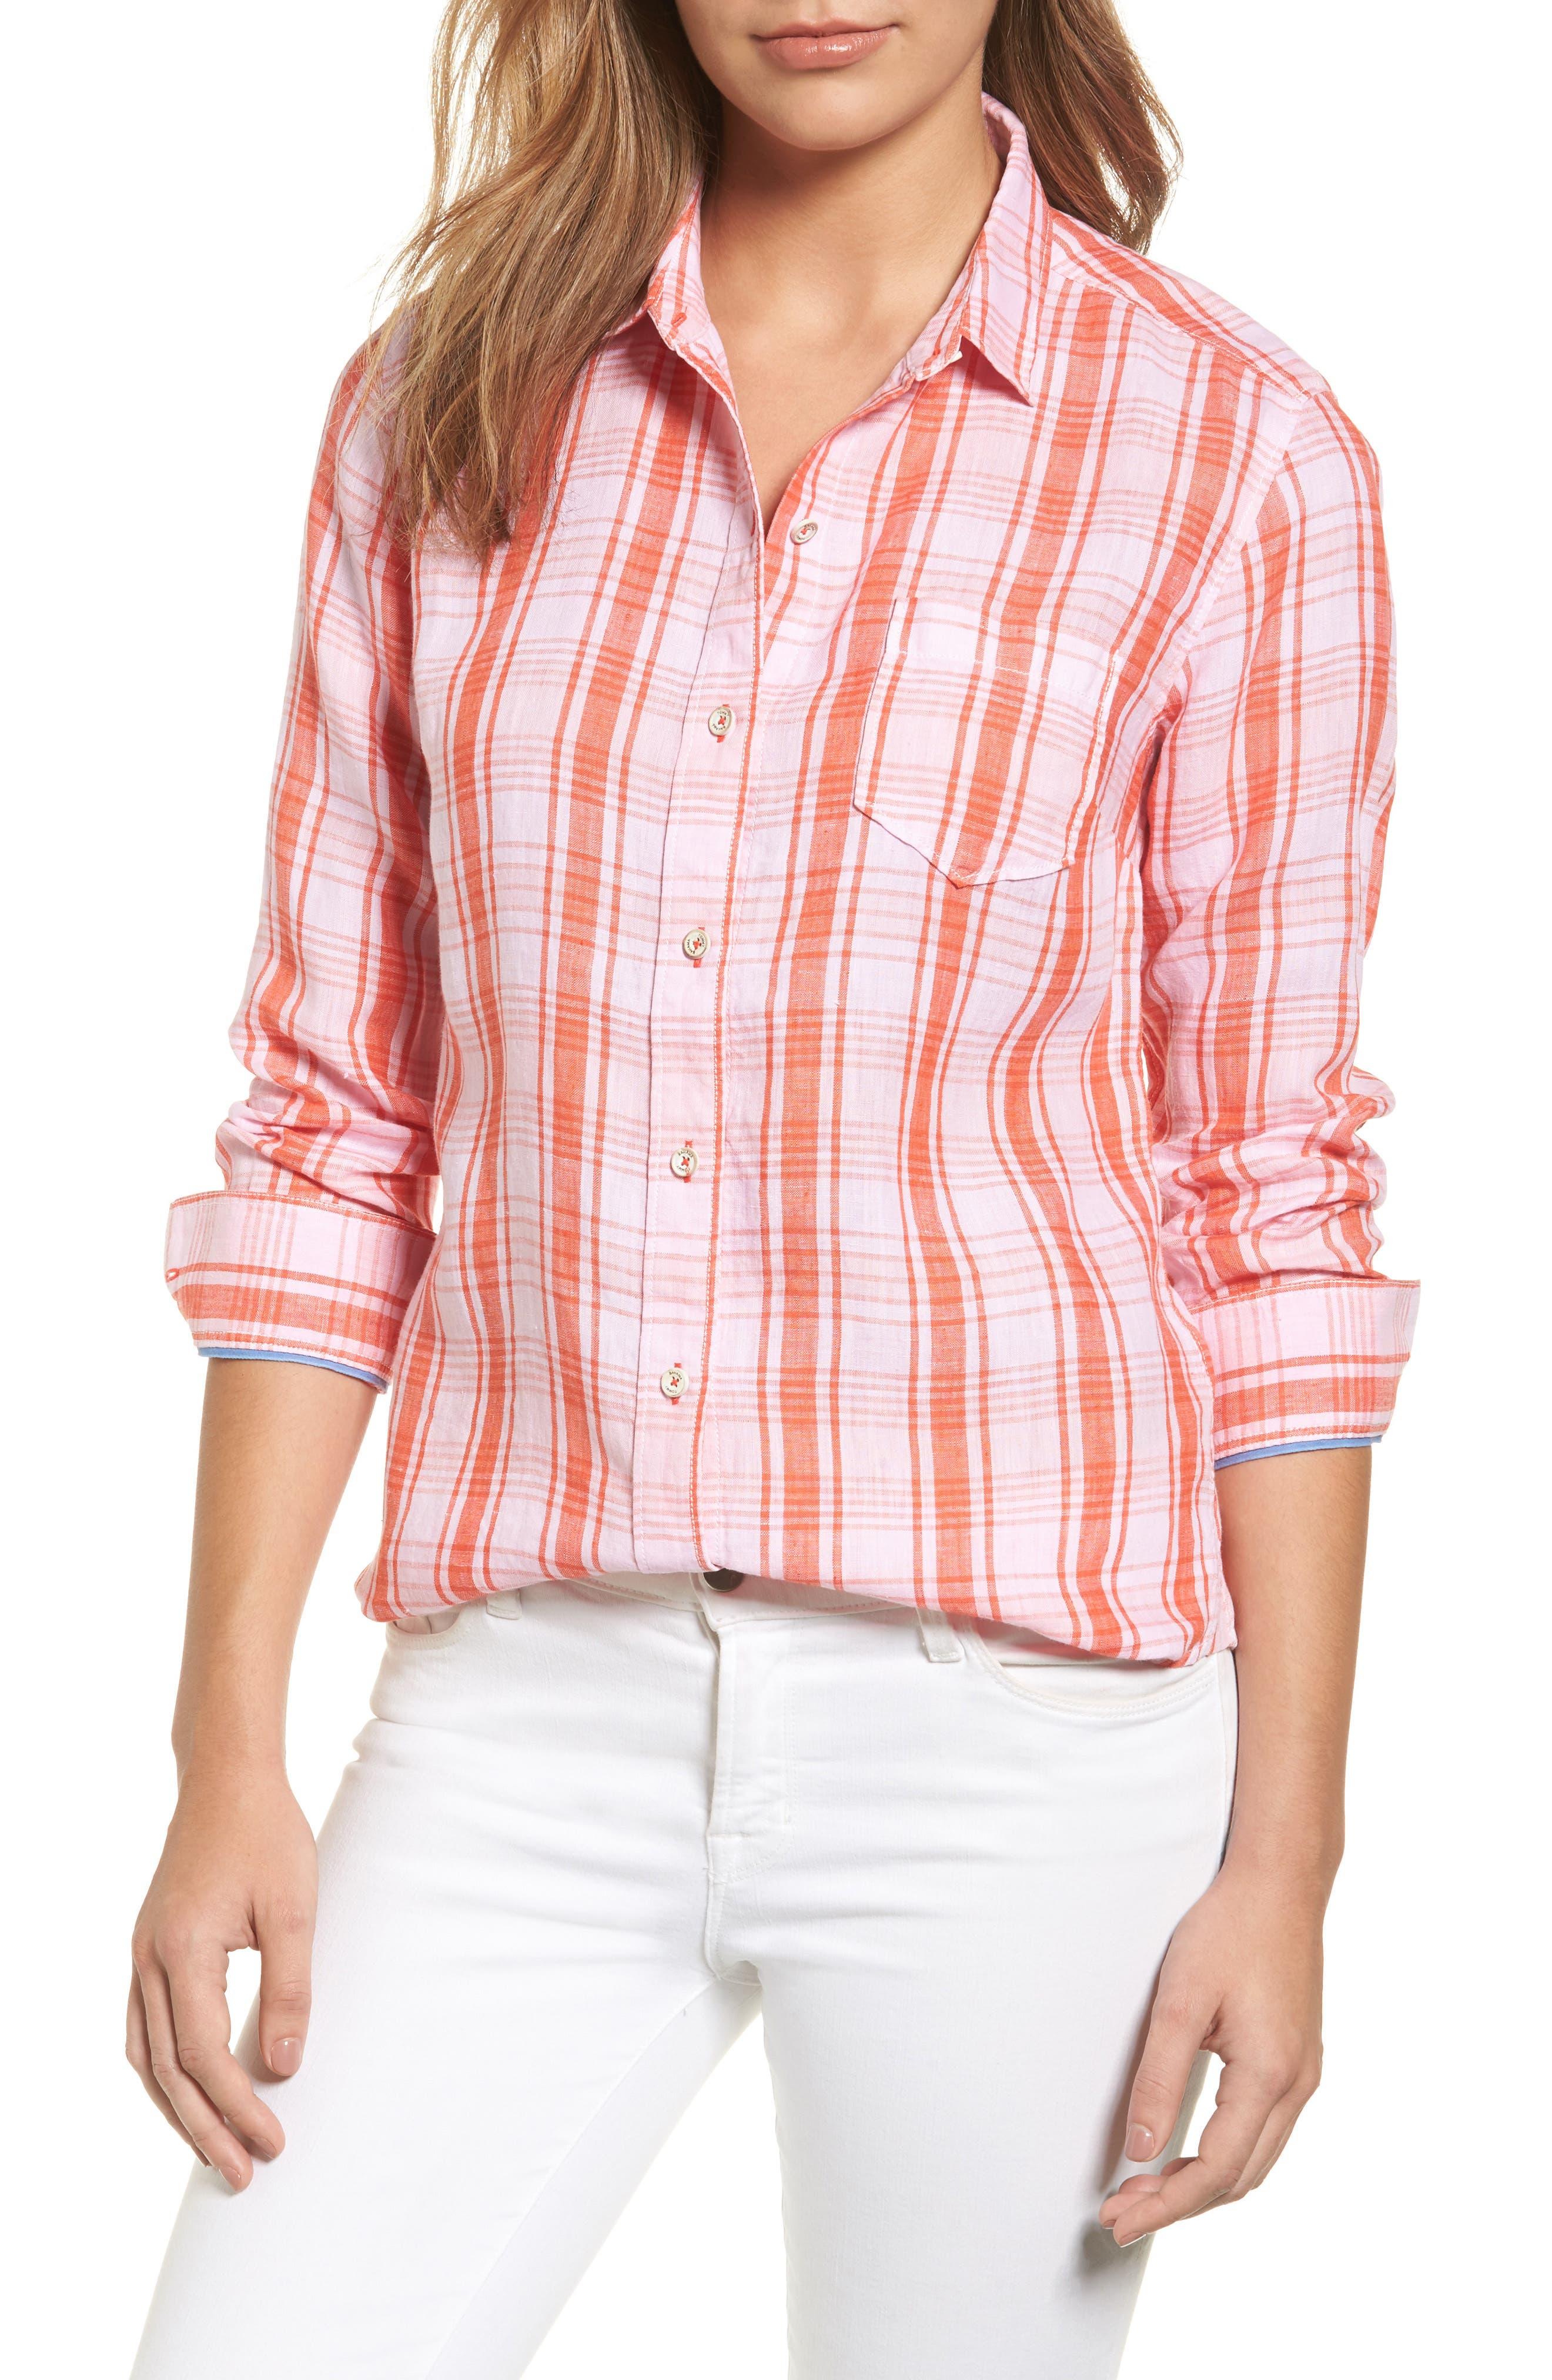 Athena Plaid Linen Shirt,                             Main thumbnail 1, color,                             800